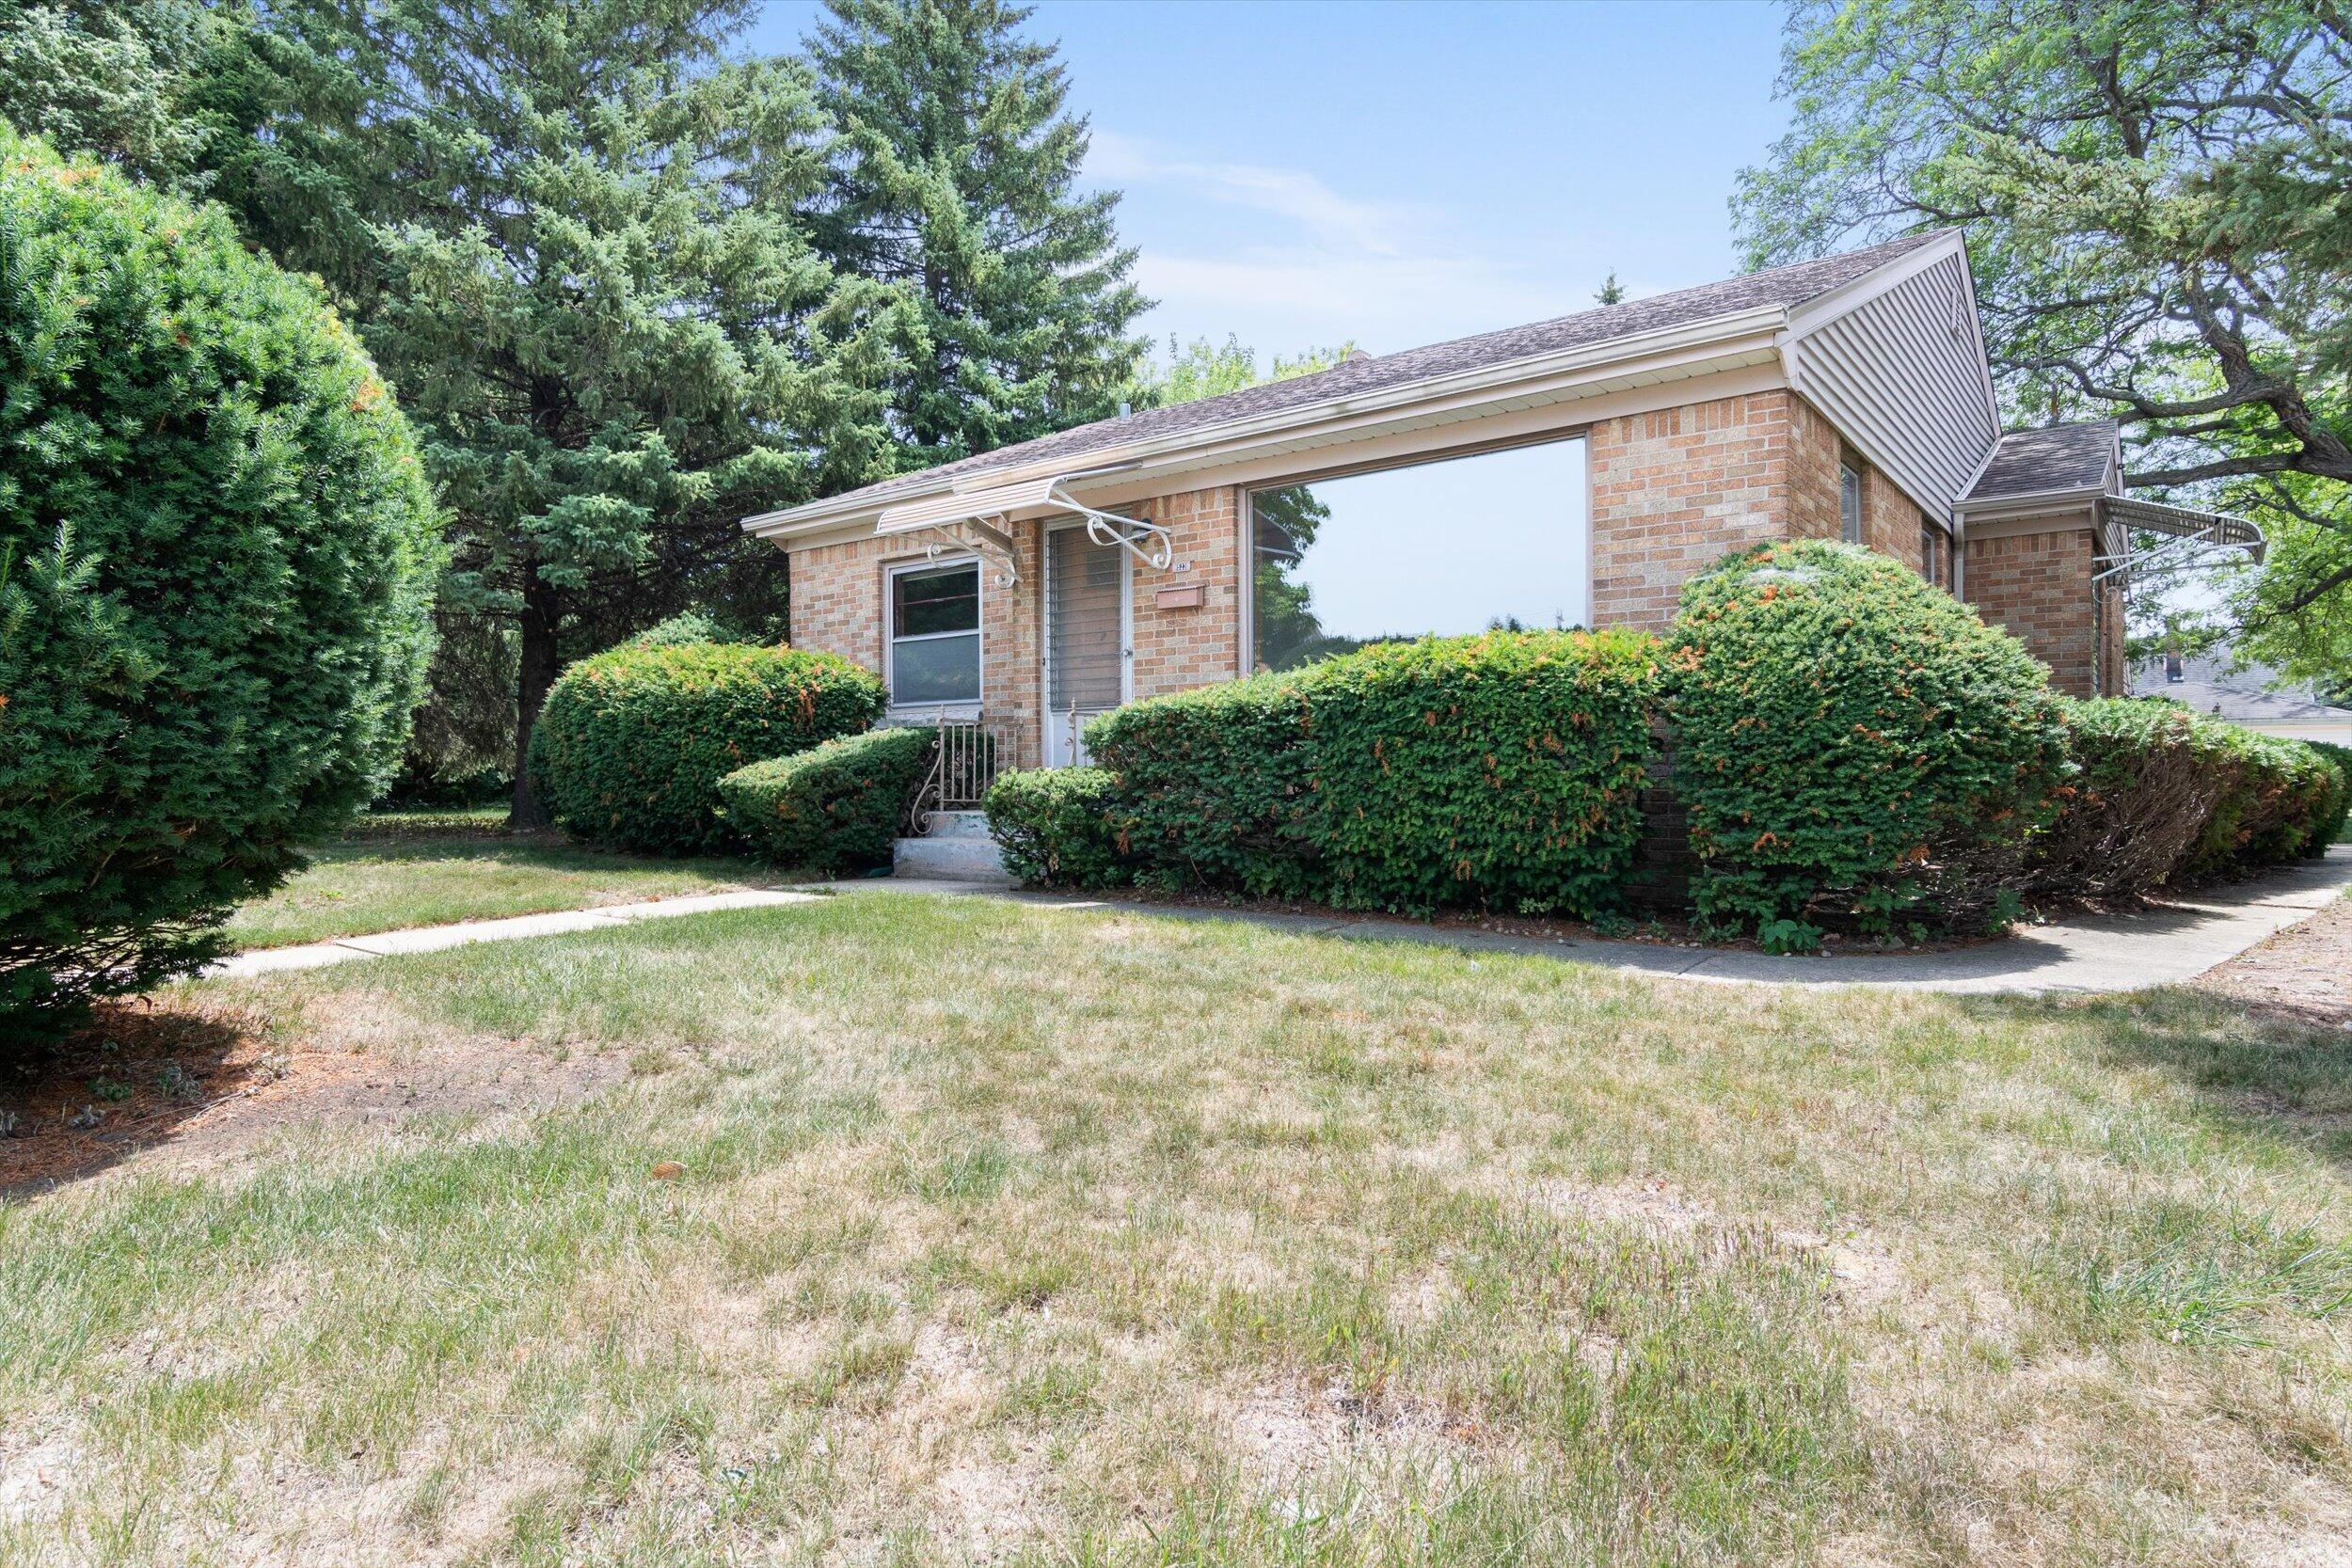 1523 Menonomee Ave, South Milwaukee, Wisconsin 53172, 2 Bedrooms Bedrooms, 4 Rooms Rooms,2 BathroomsBathrooms,Single-Family,For Sale,Menonomee Ave,1755557